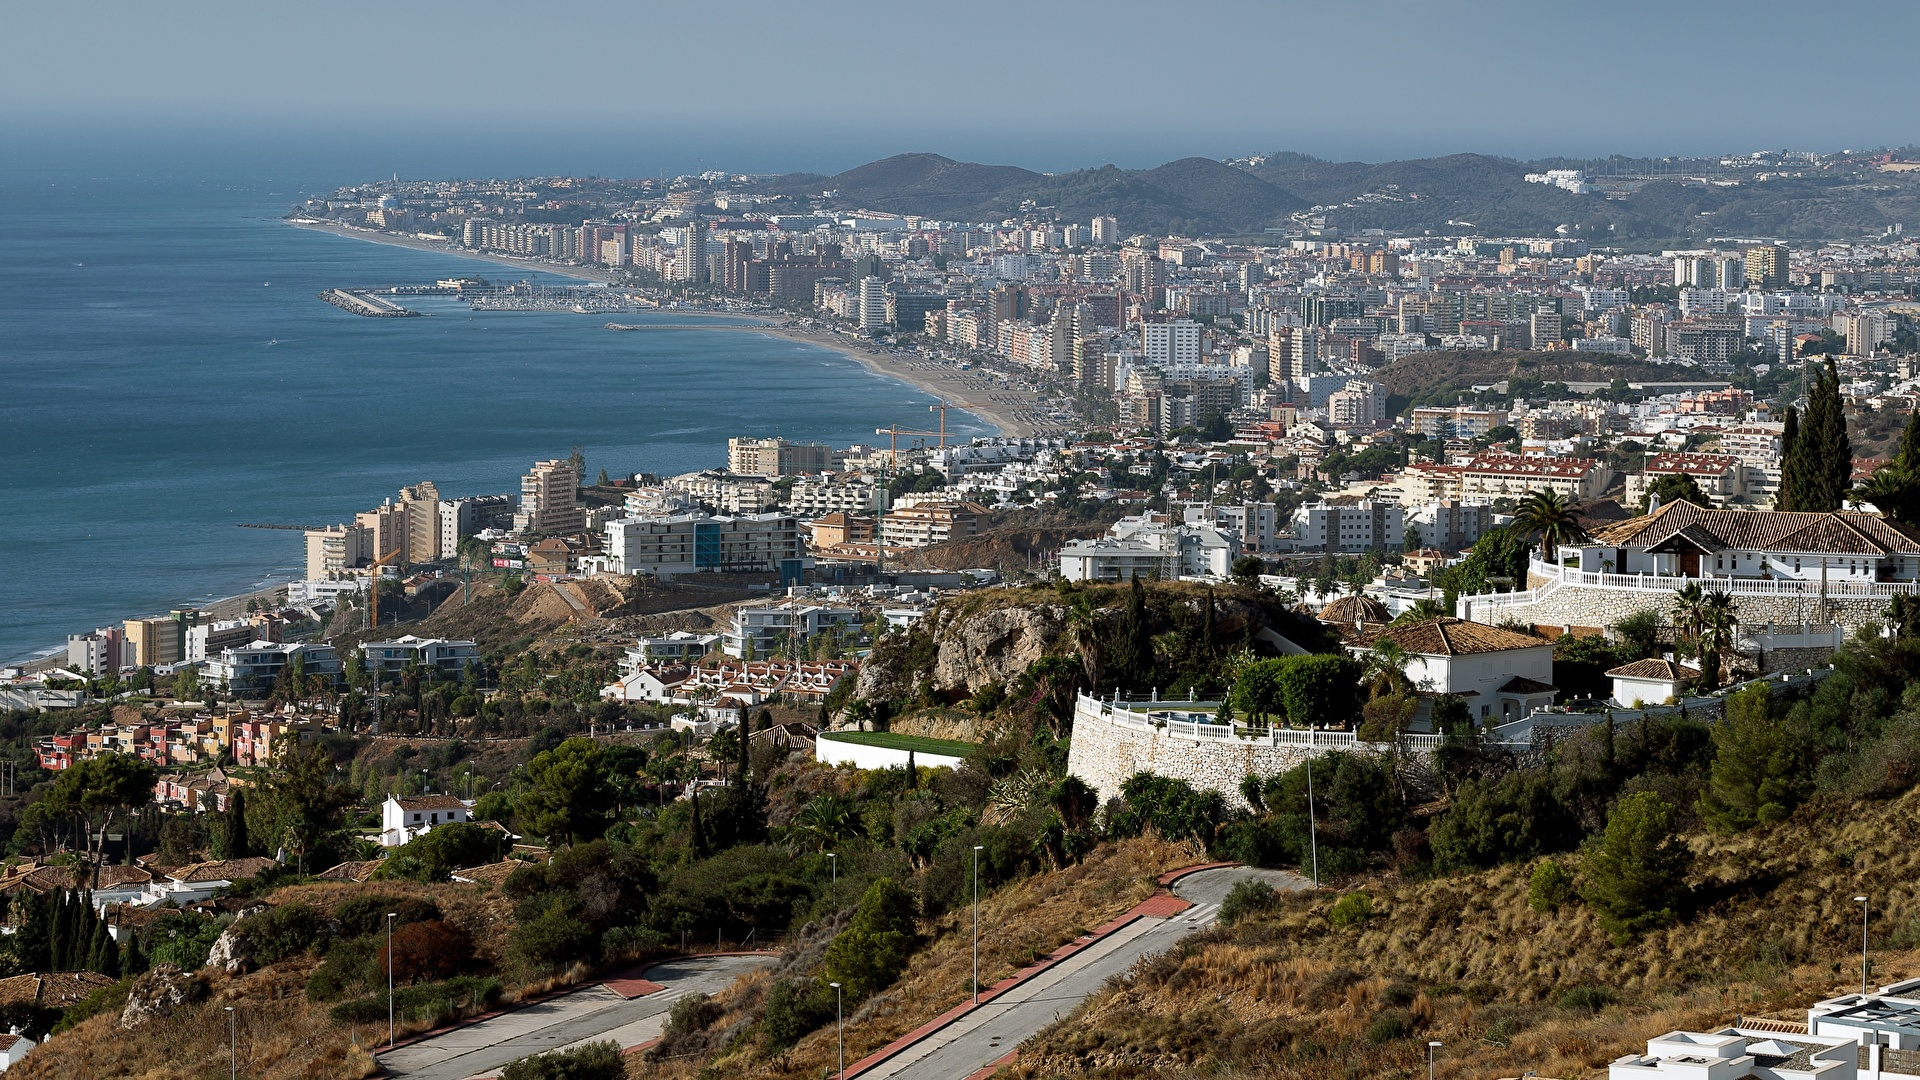 Картинка Испания Andalusia, Fuengirola Побережье Дома Города 1920x1080 берег город Здания